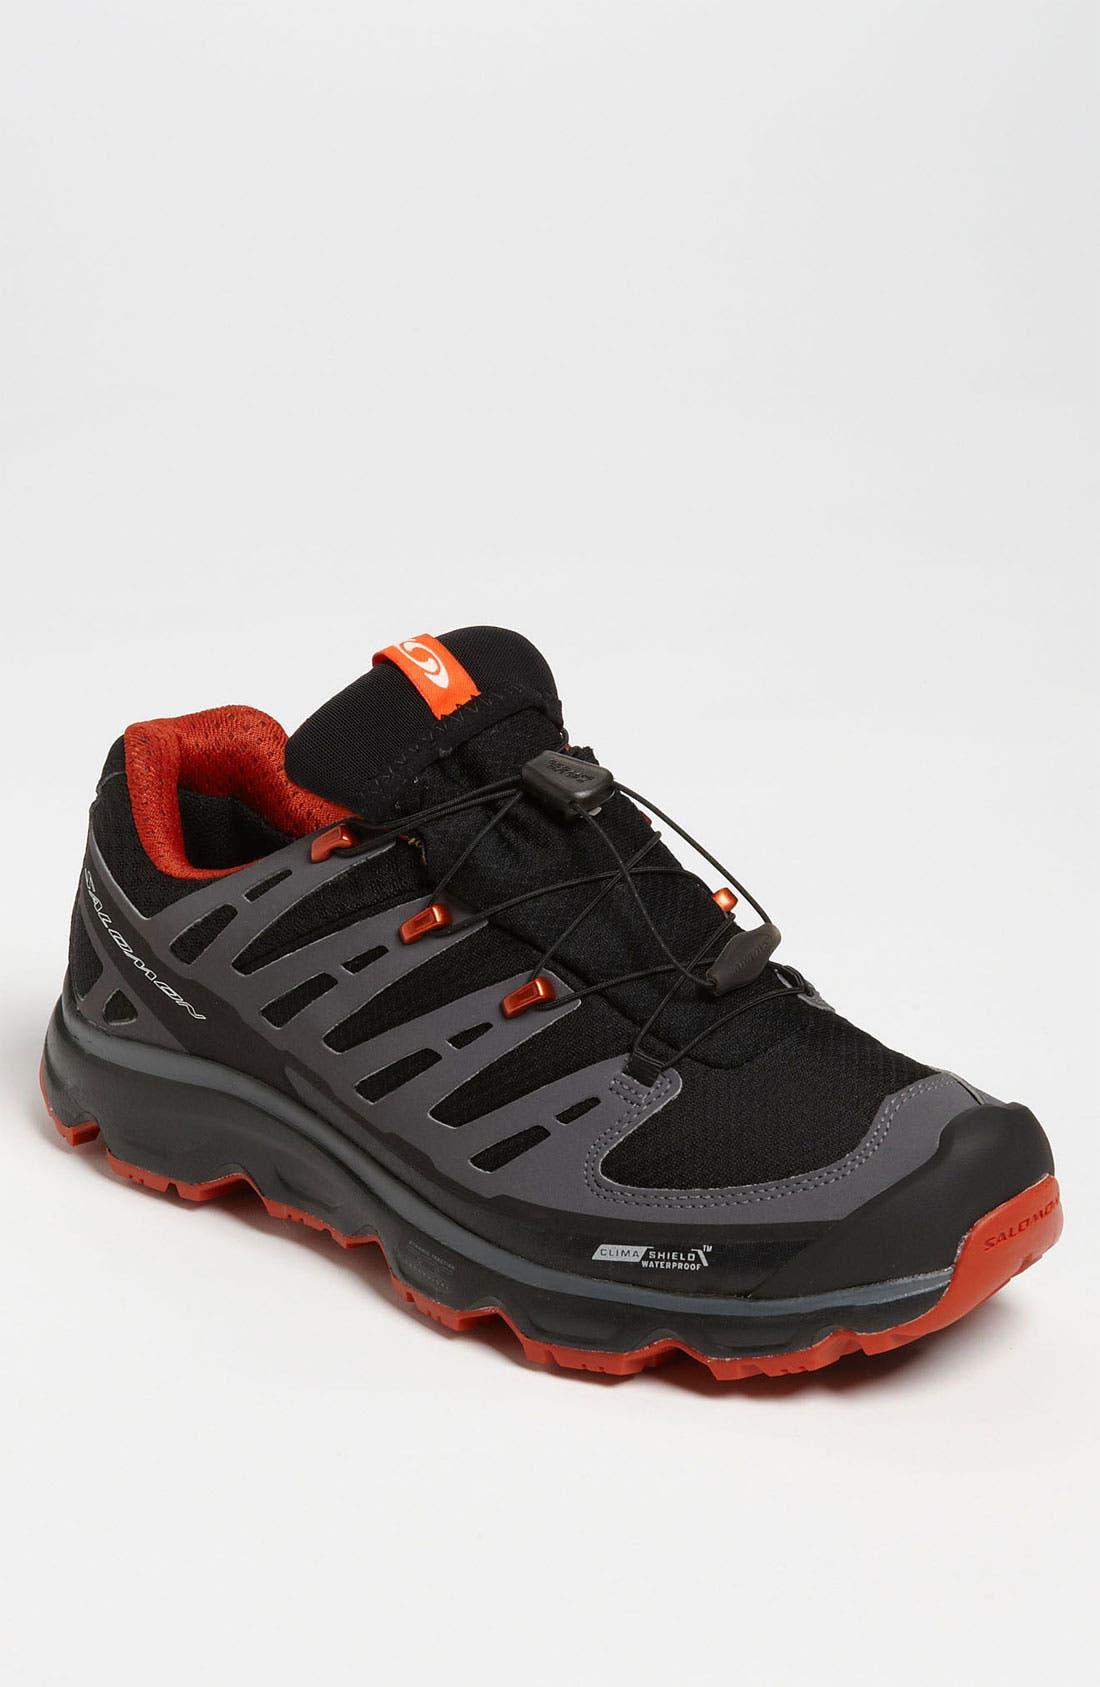 Main Image - Salomon 'Synapse CS' Hiking Shoe (Men)